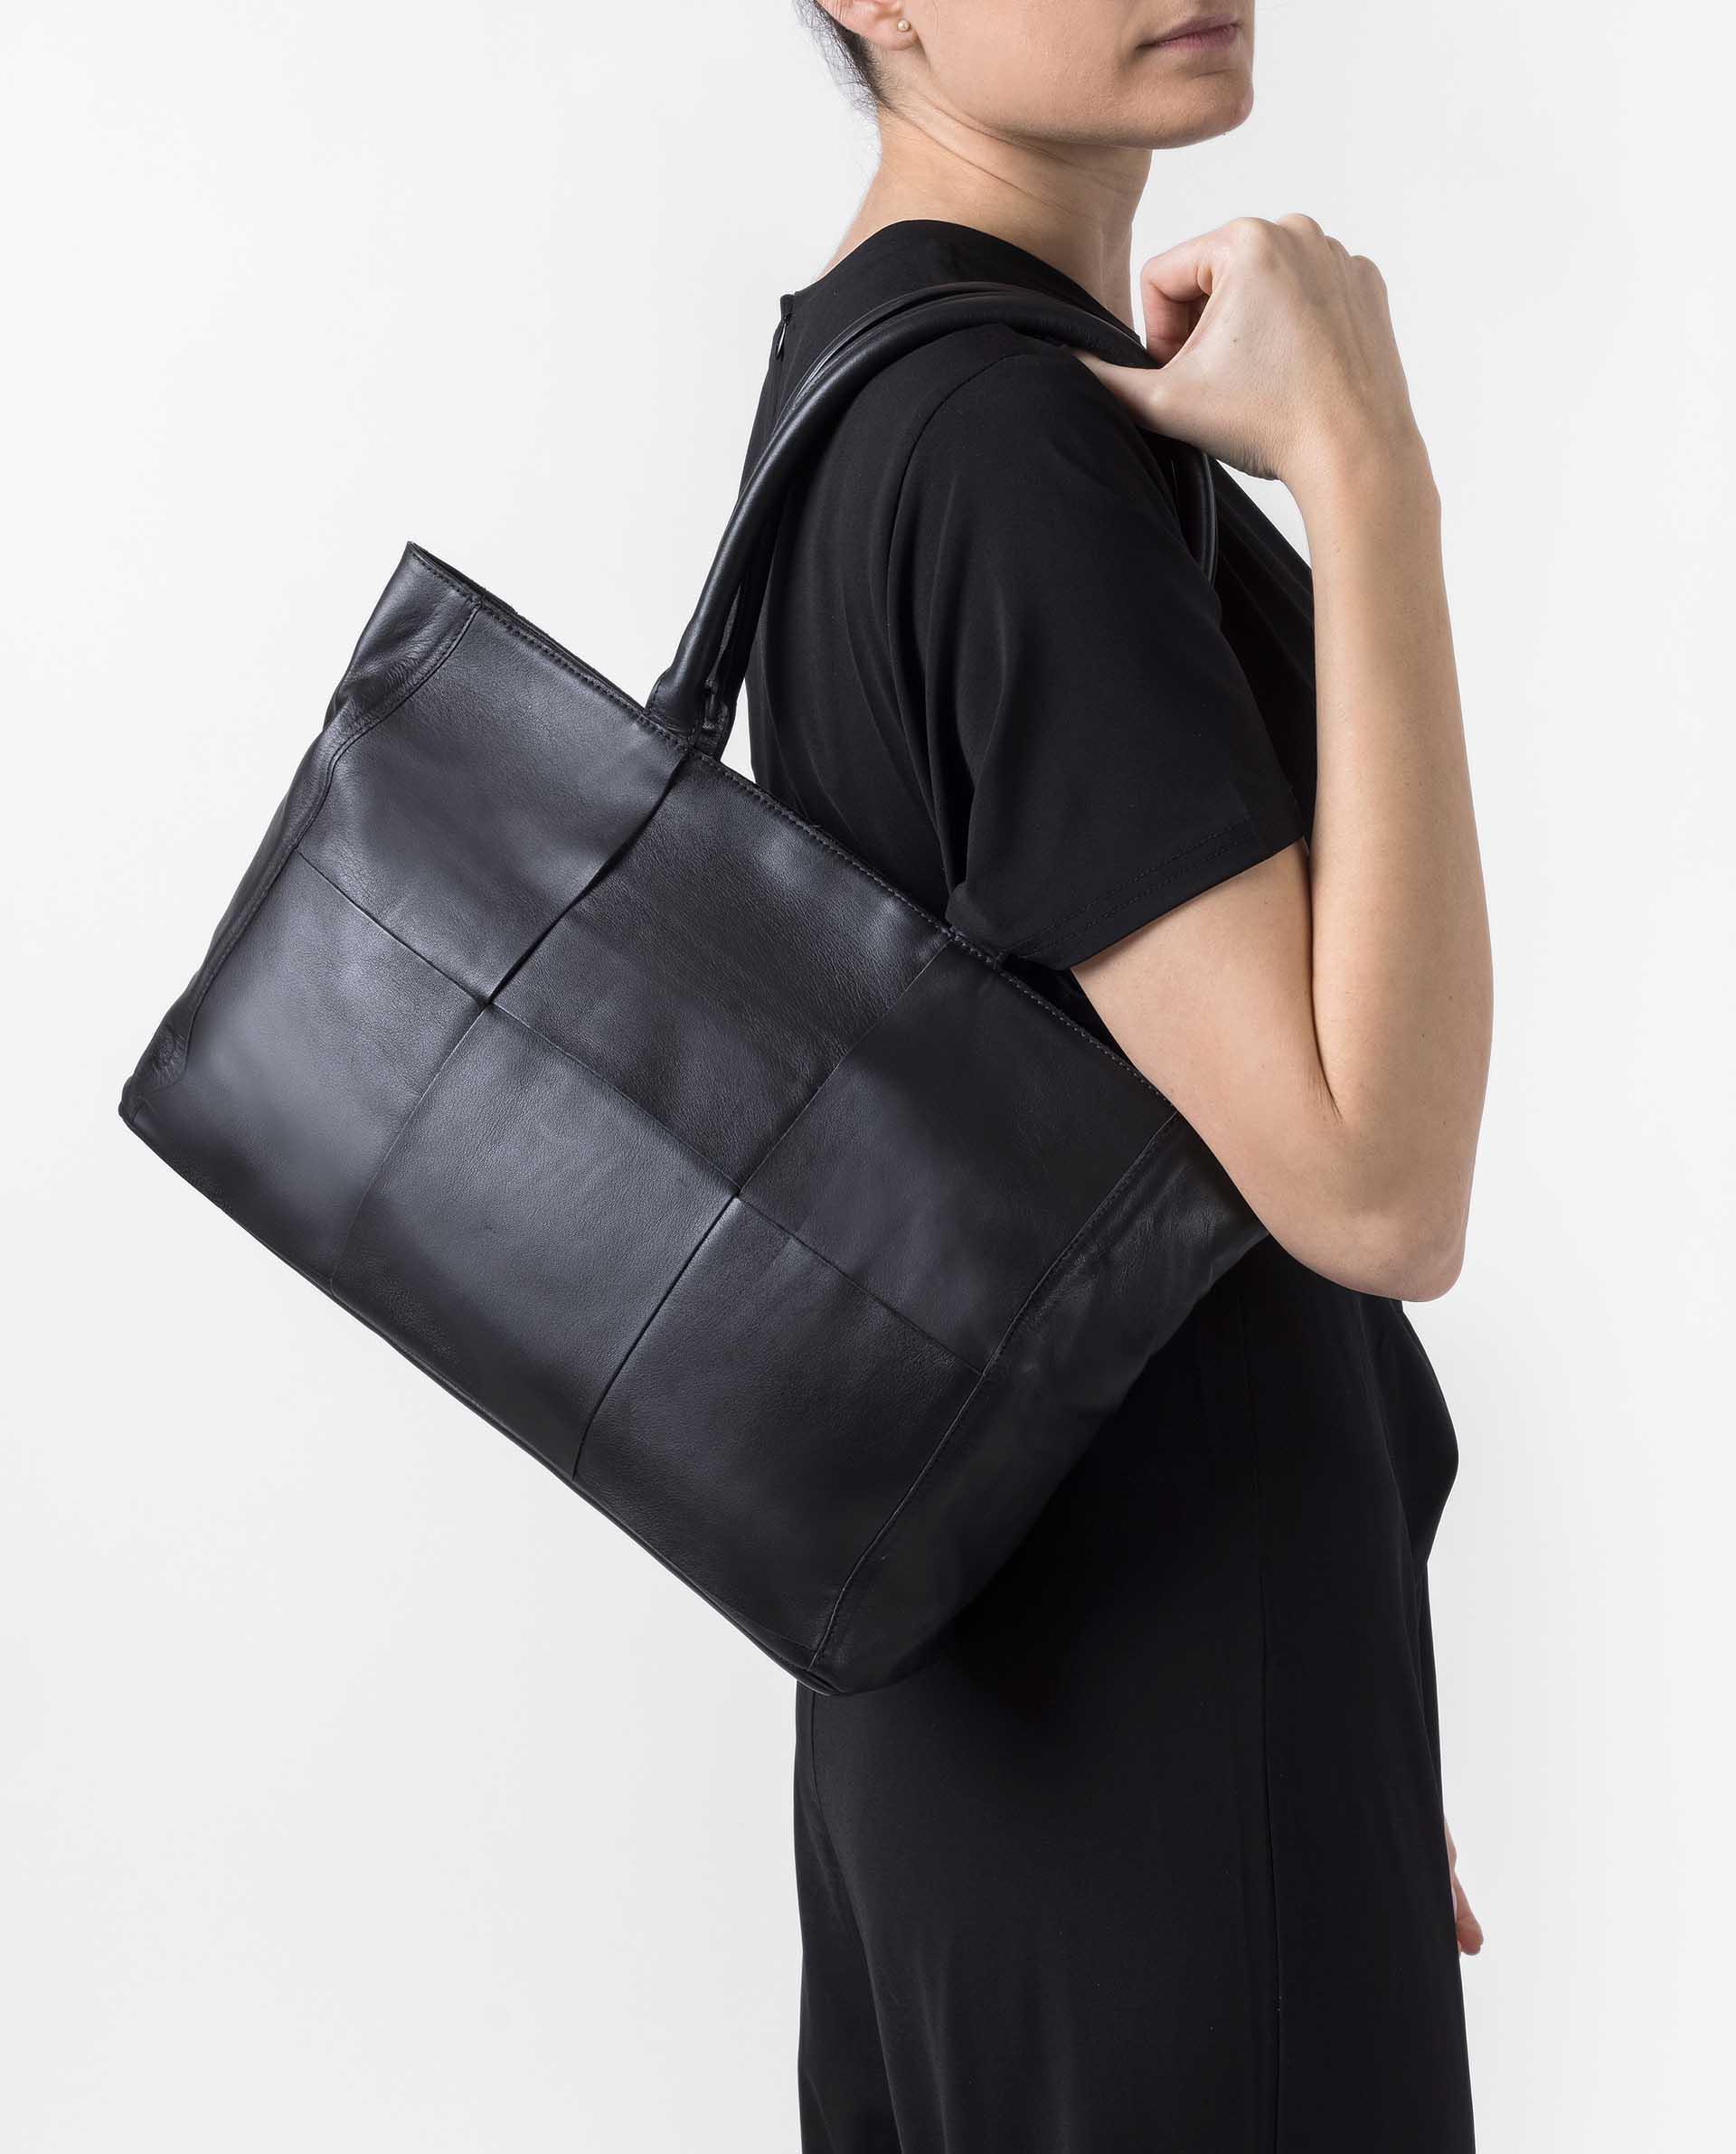 UNISA Medium size leather bag ZNIOBE_NT 2